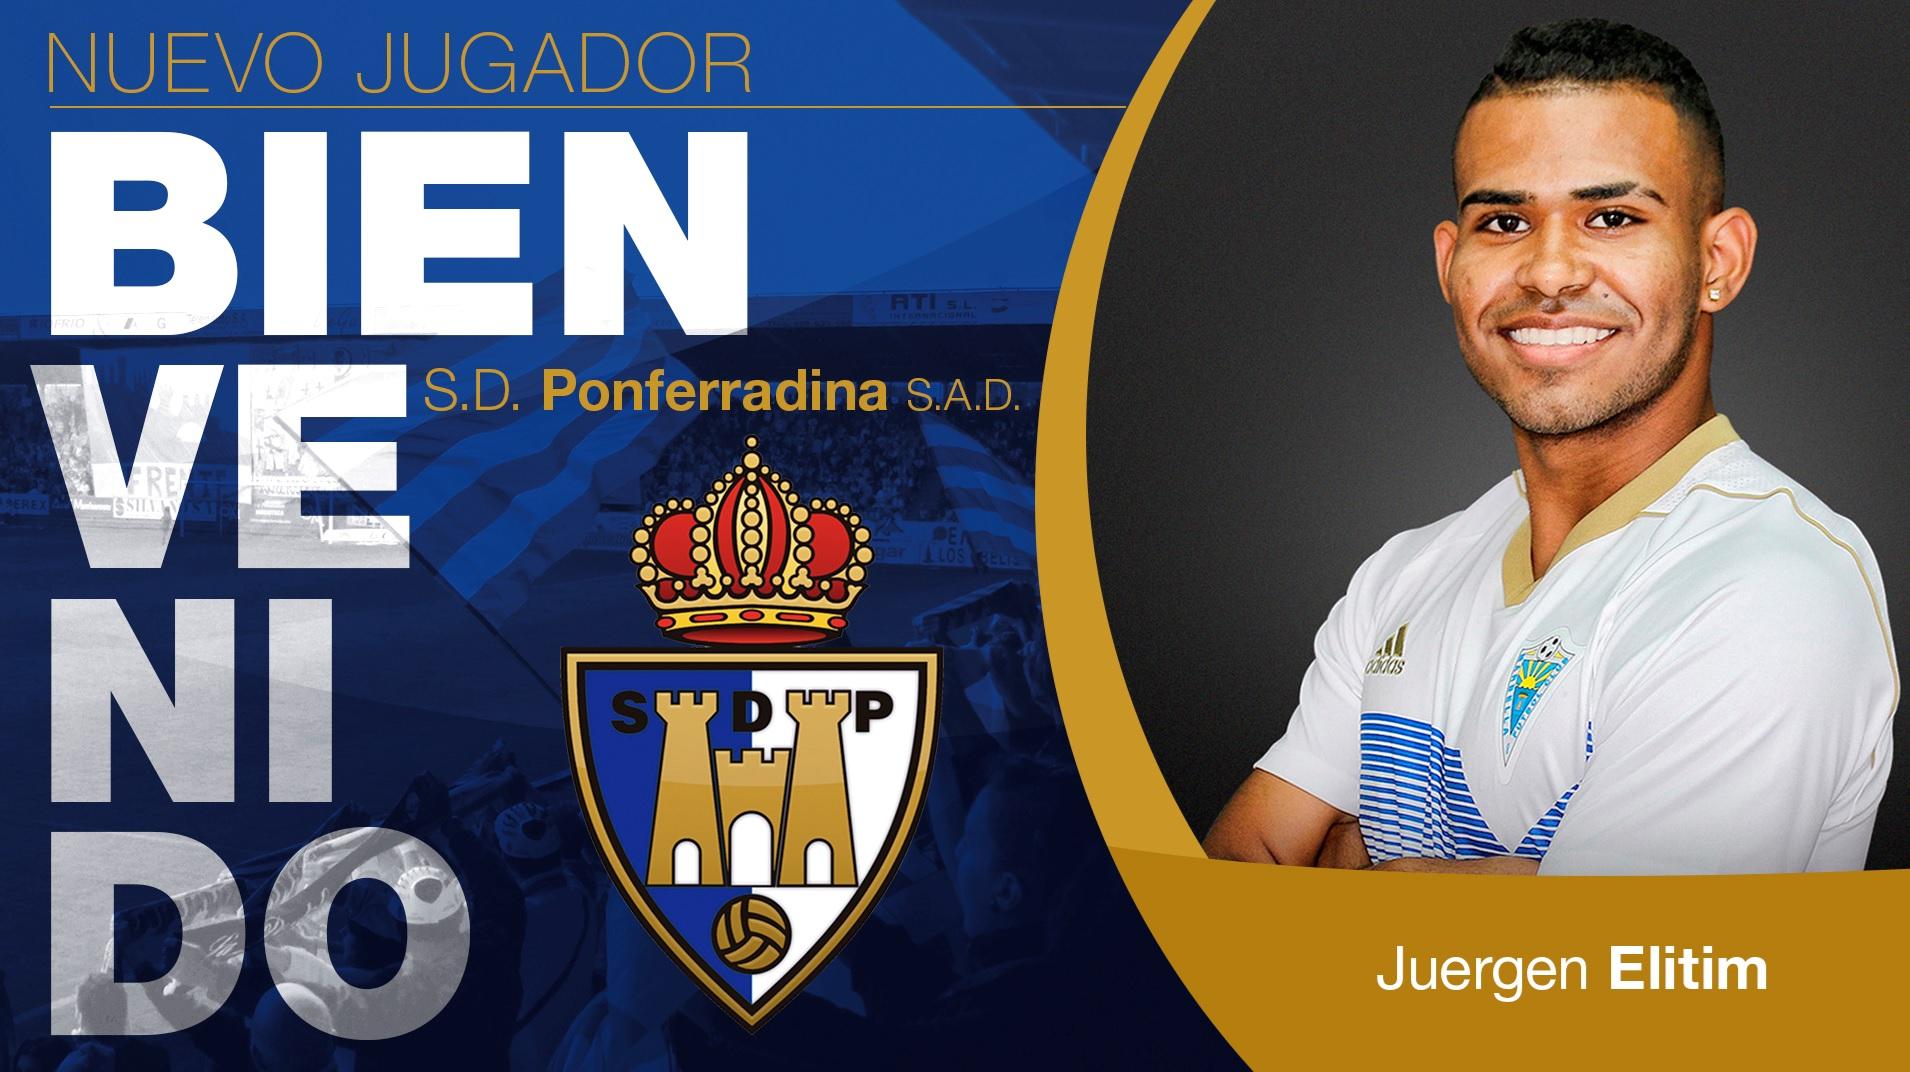 El futbolista colombiano Juergen Elitim se incorpora a la SD Ponferradina 1